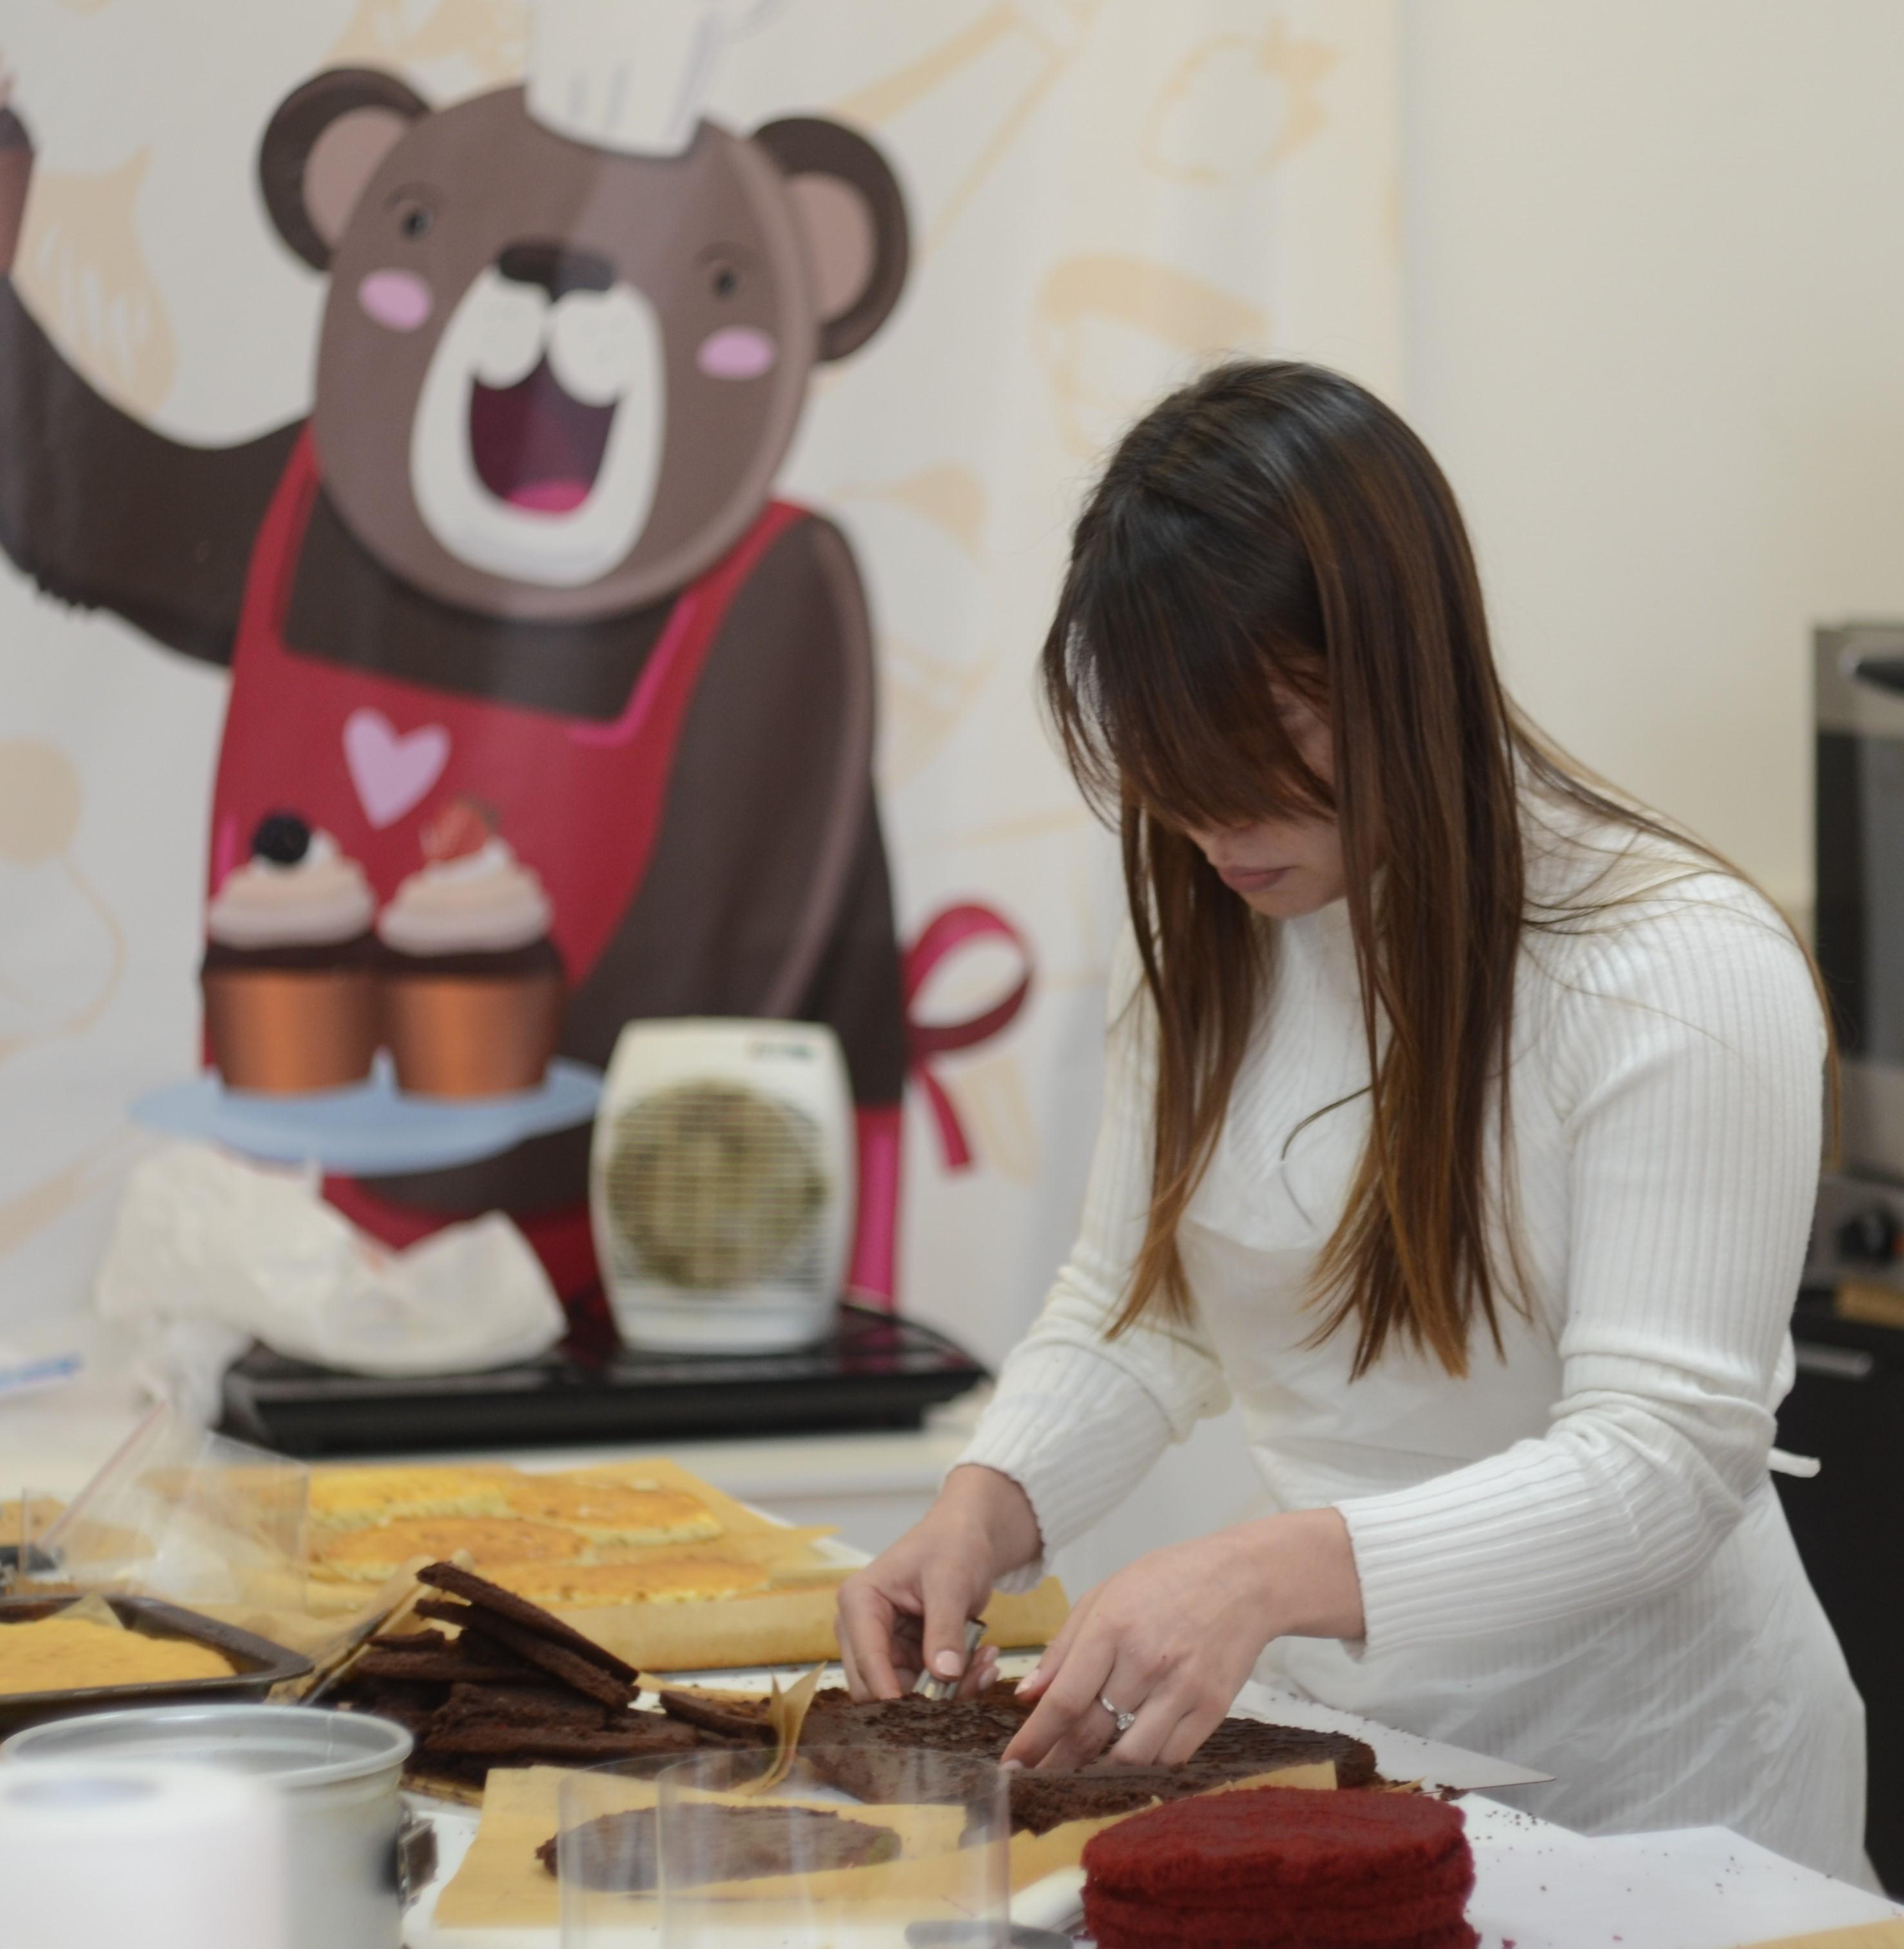 http://odry-school.ru/images/upload/DSC_0368.JPG